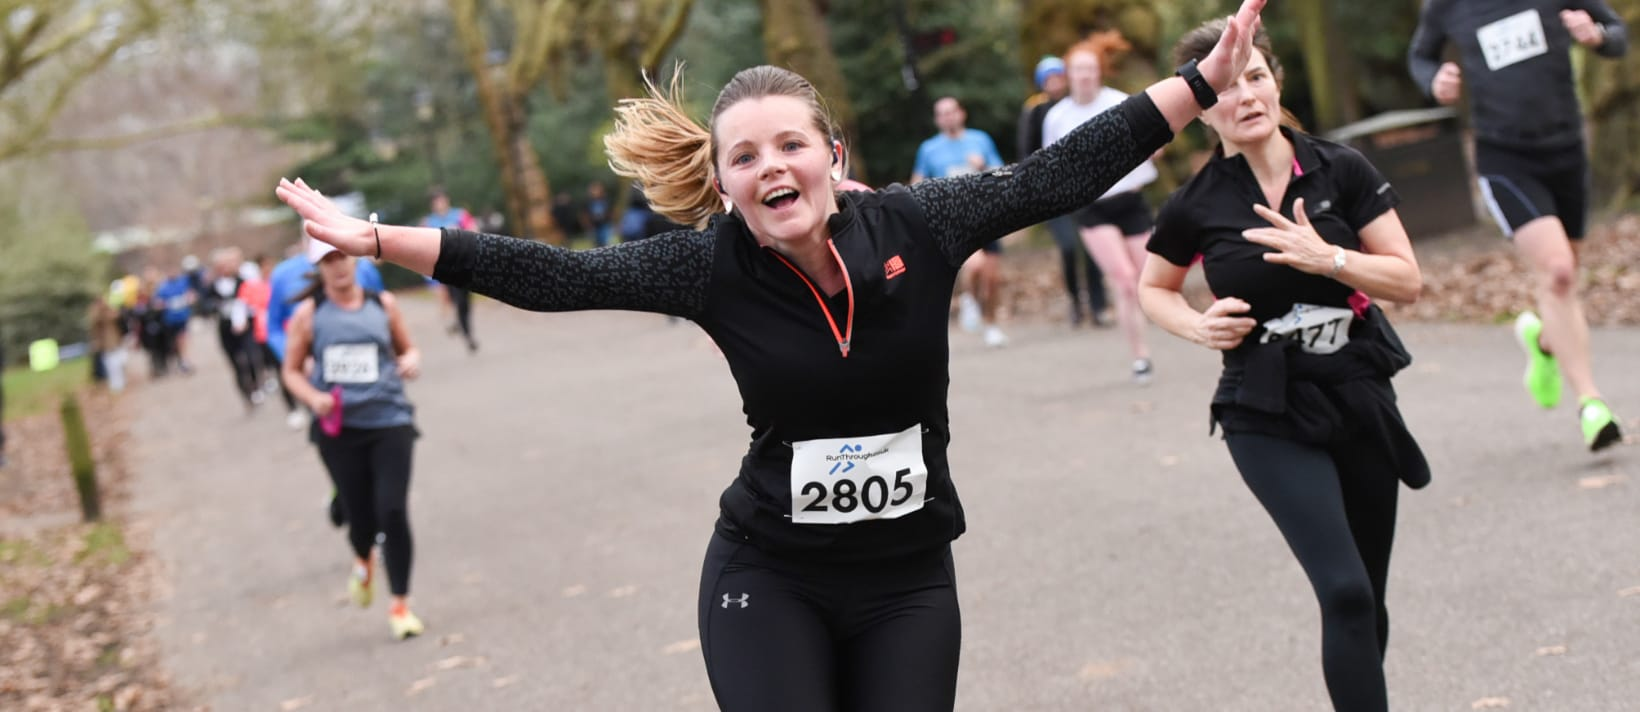 Battersea Park Half Marathon - September